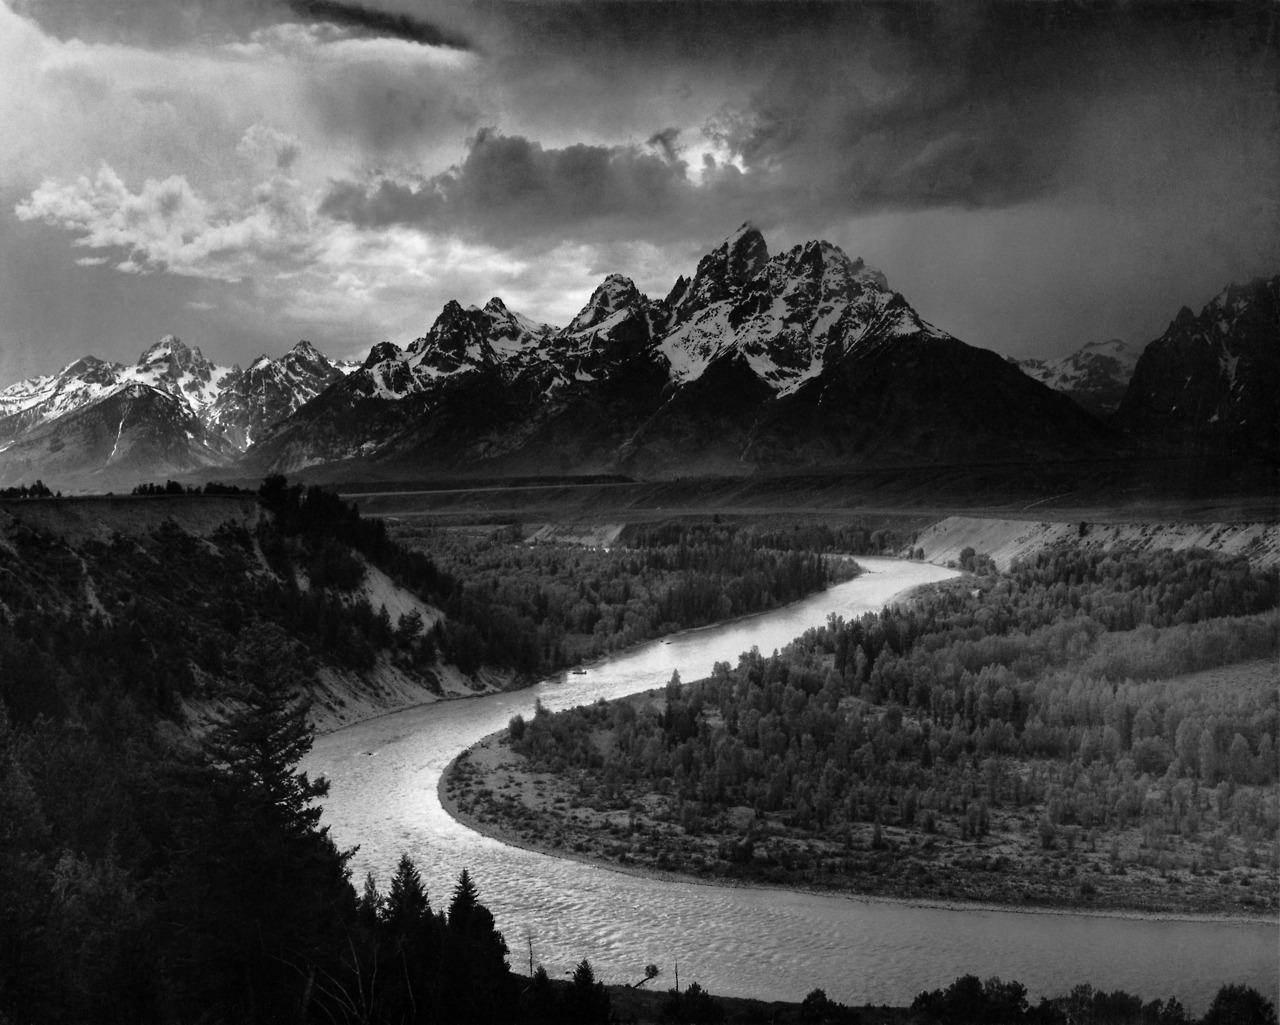 Ansel Adams, the wilderness